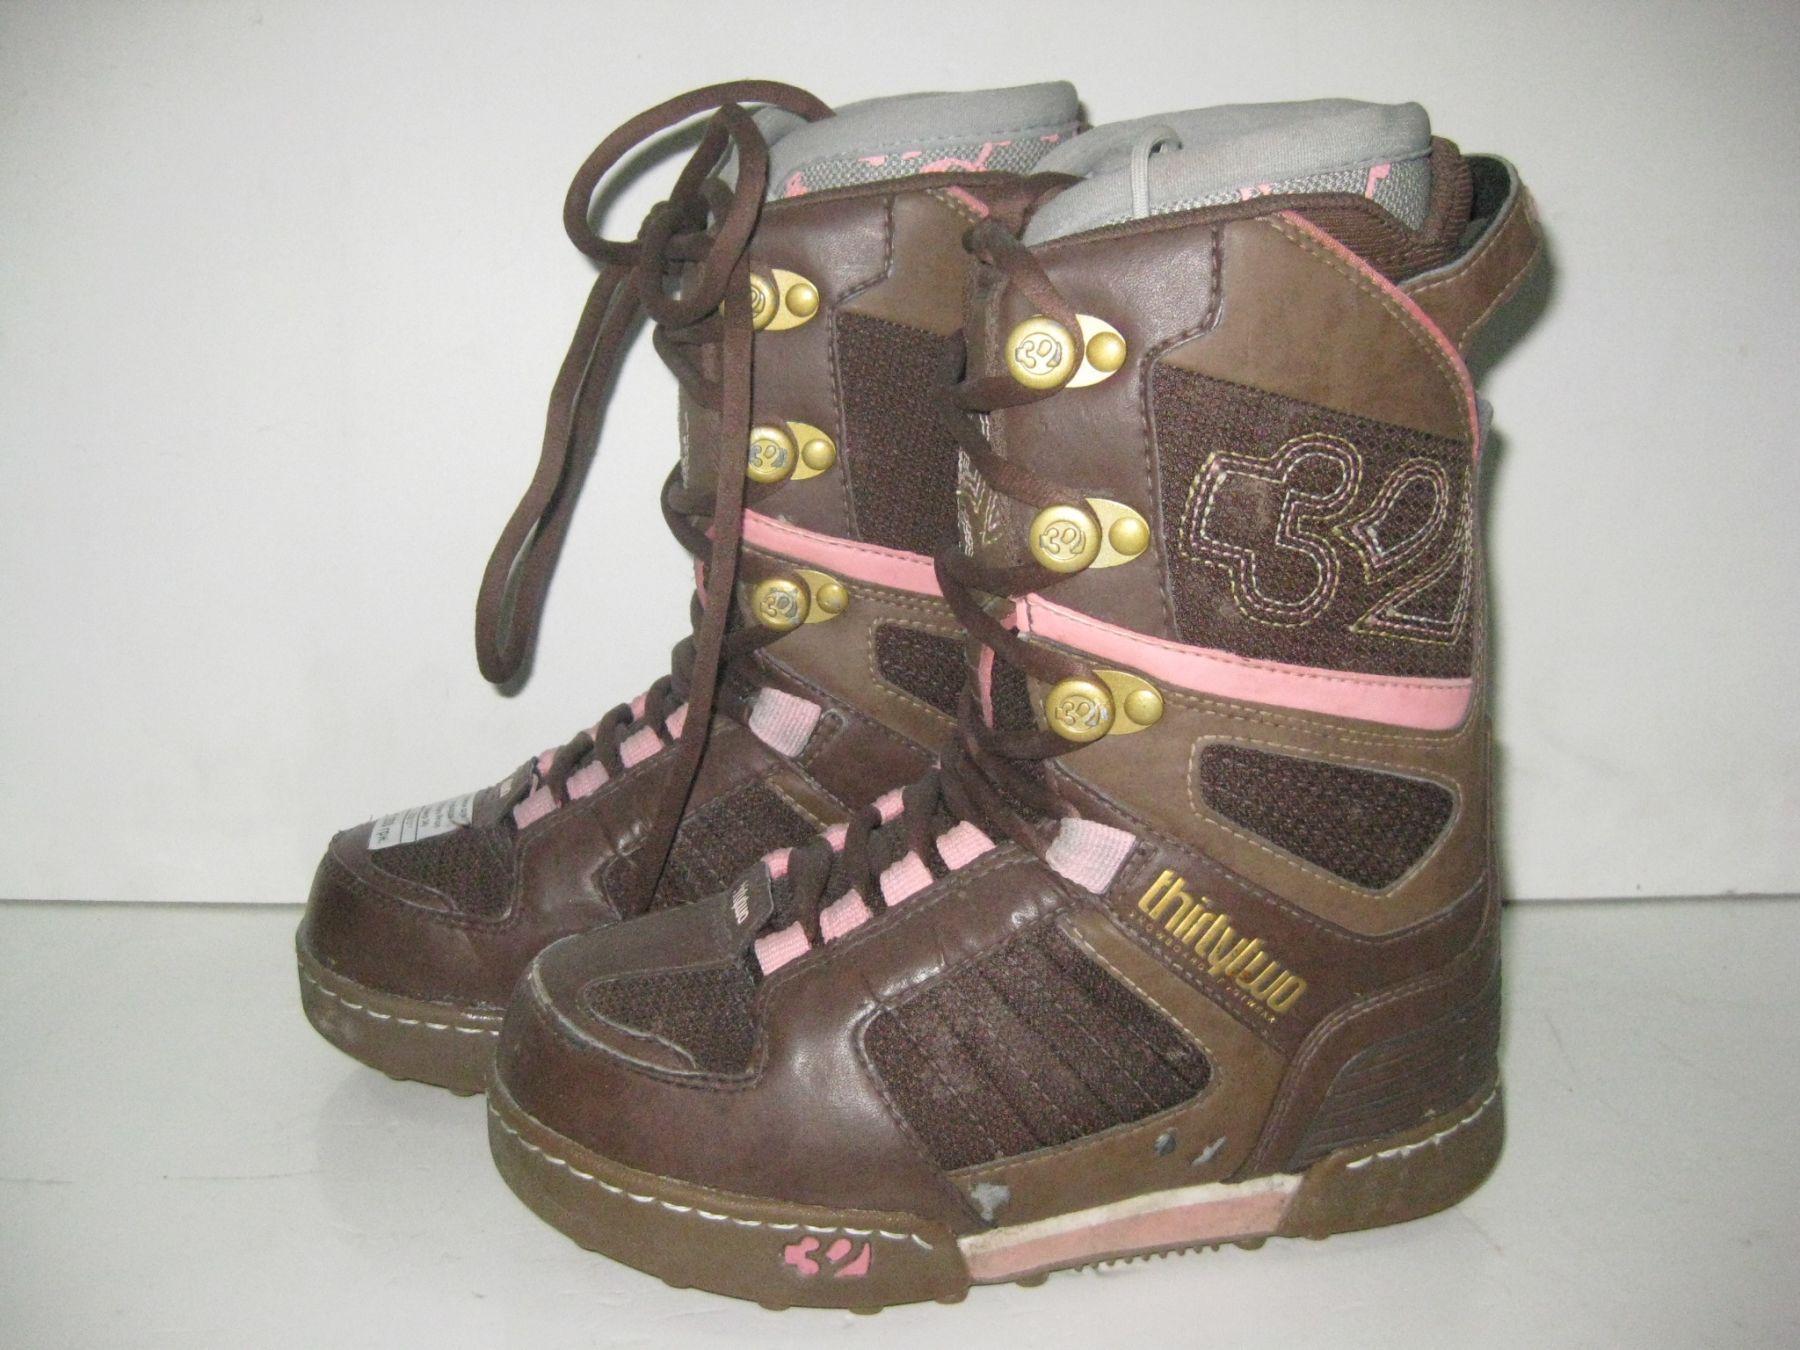 b0a9316f610e Ботинки для сноуборда Thirtytwo Prion (размер 34) - купить по ...